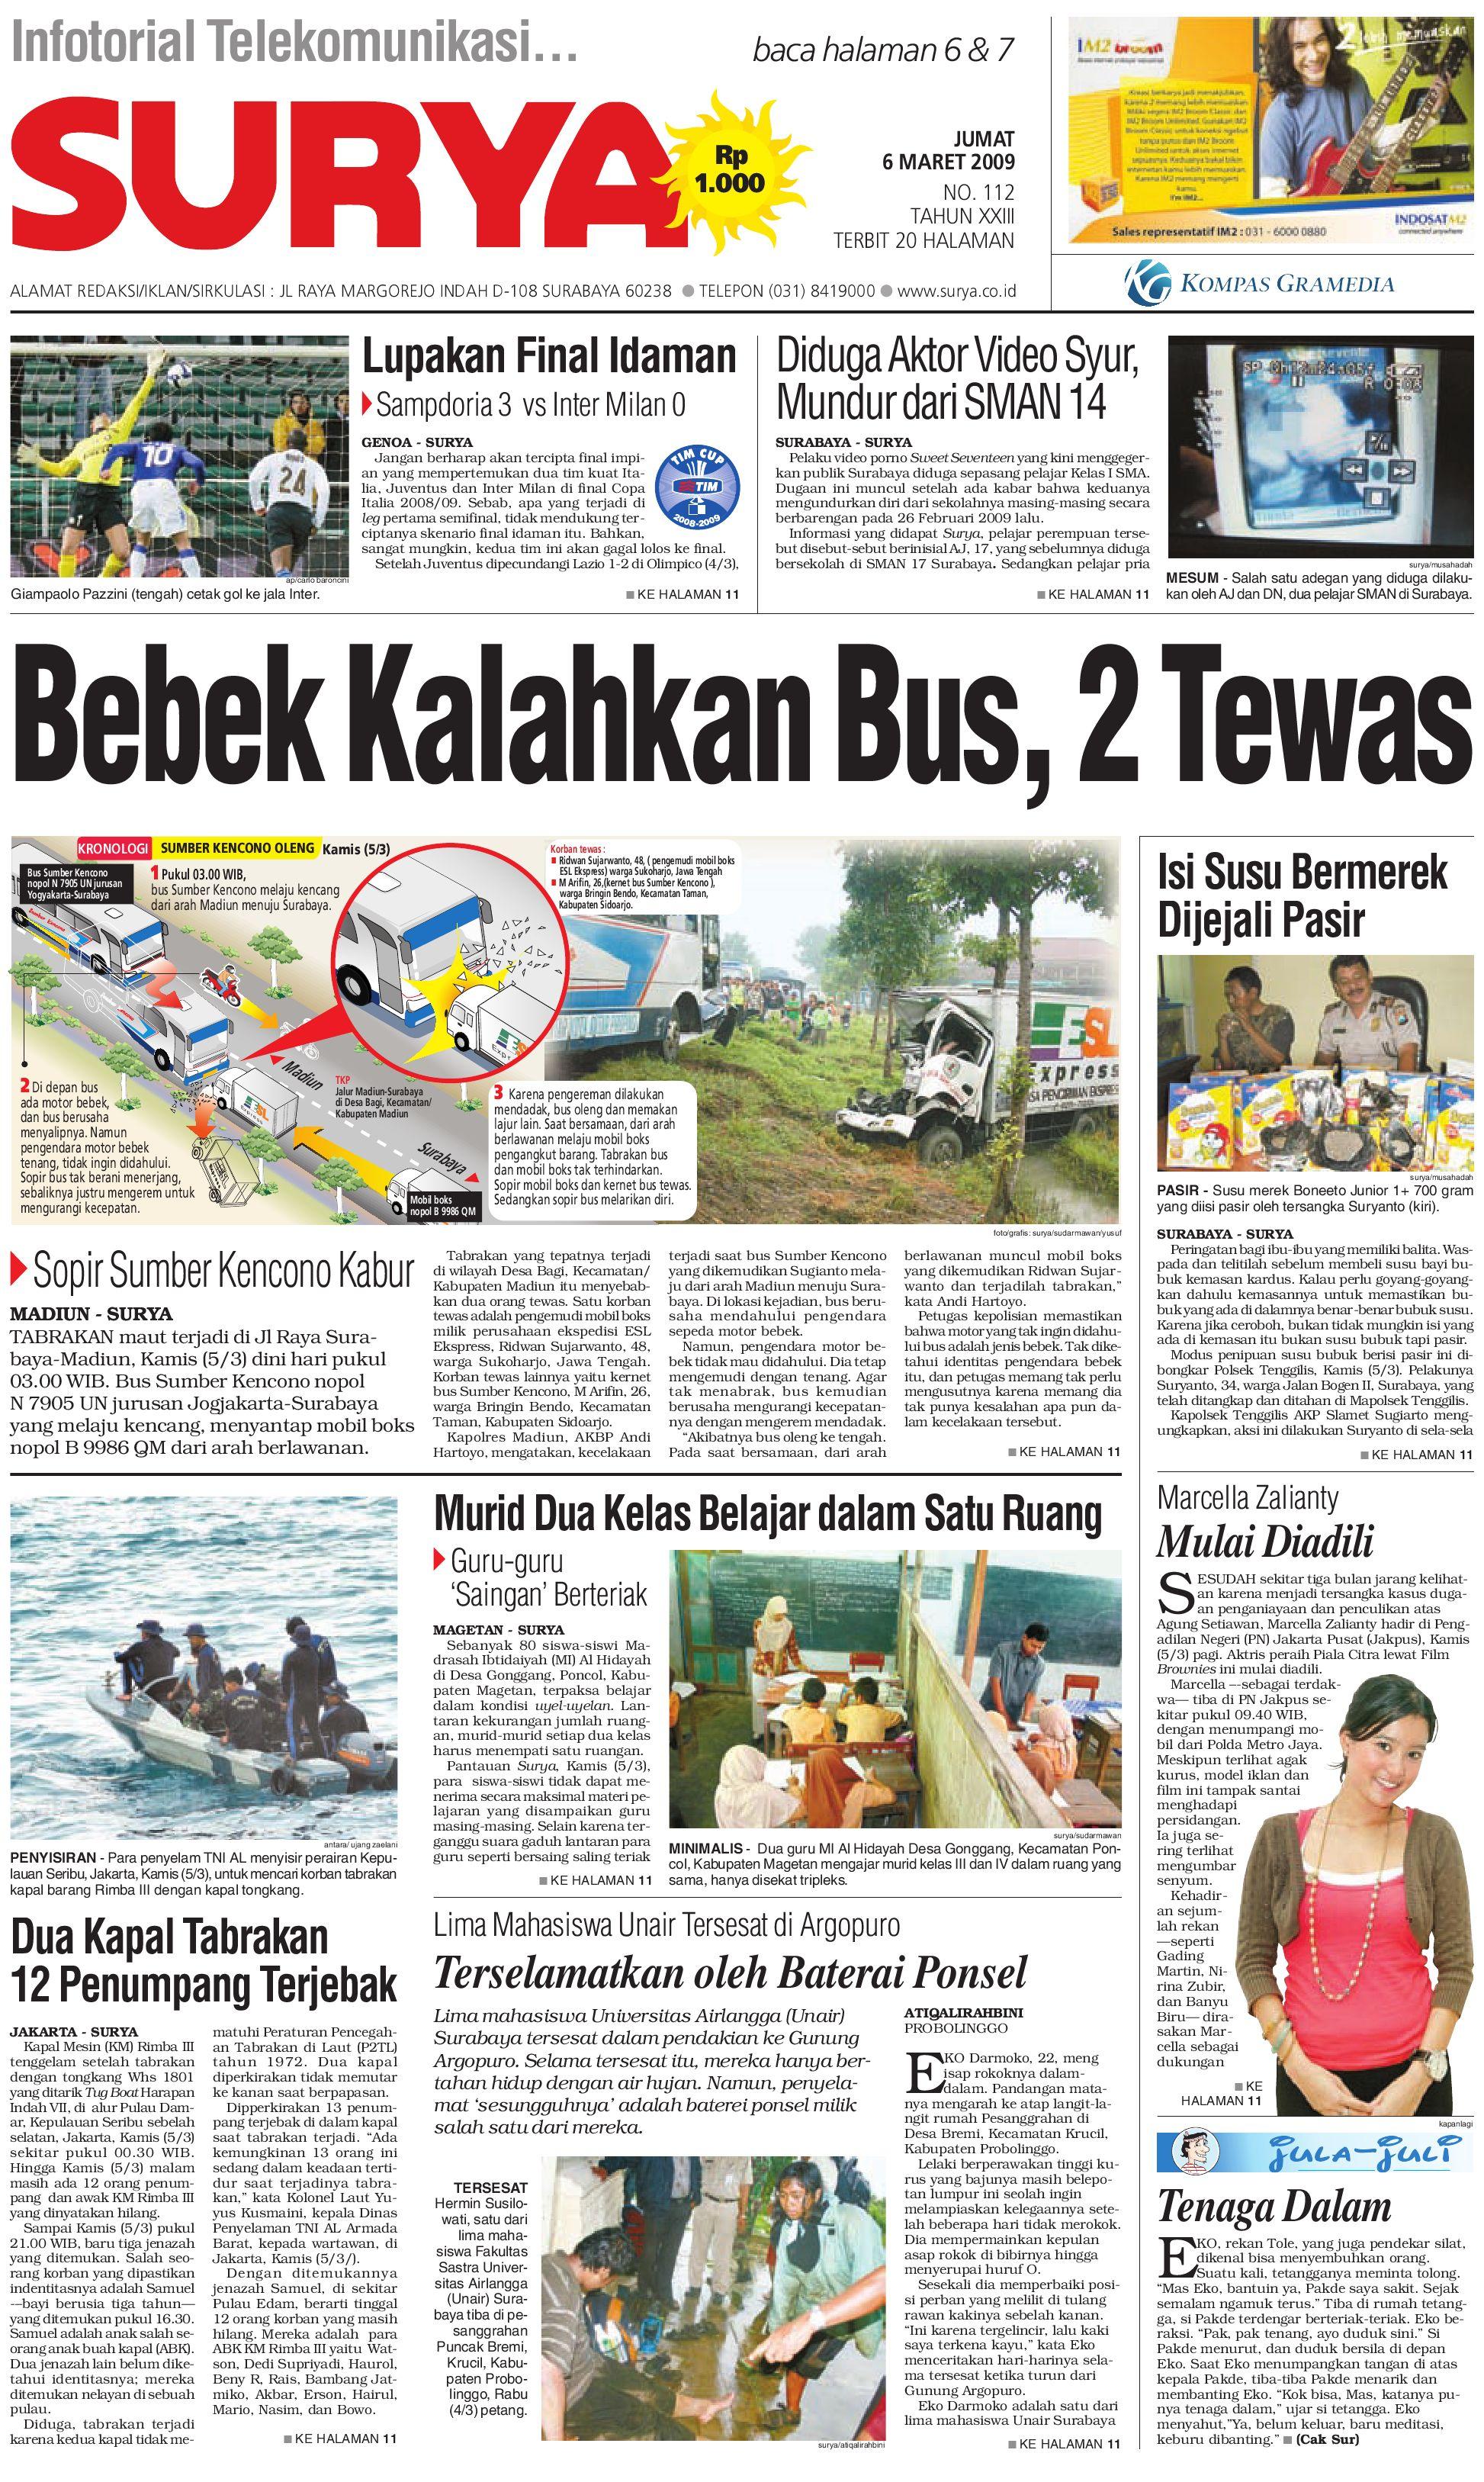 Edisi Cetak 06 Maret 2009 By Harian Surya Issuu